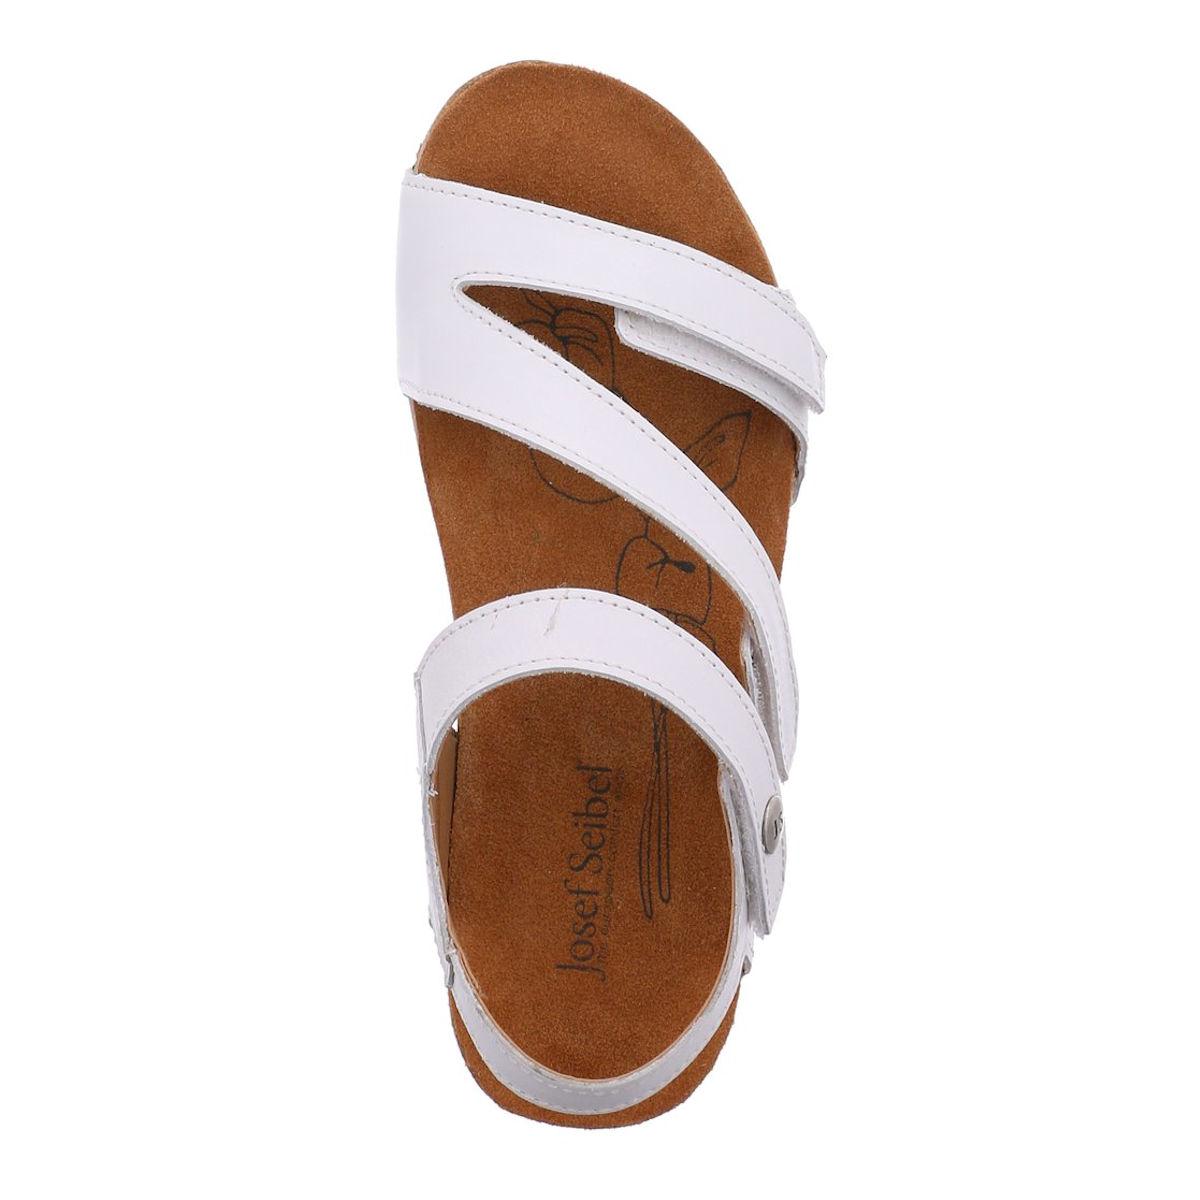 Josef Seibel Tonga 25 - Womens White Sandal